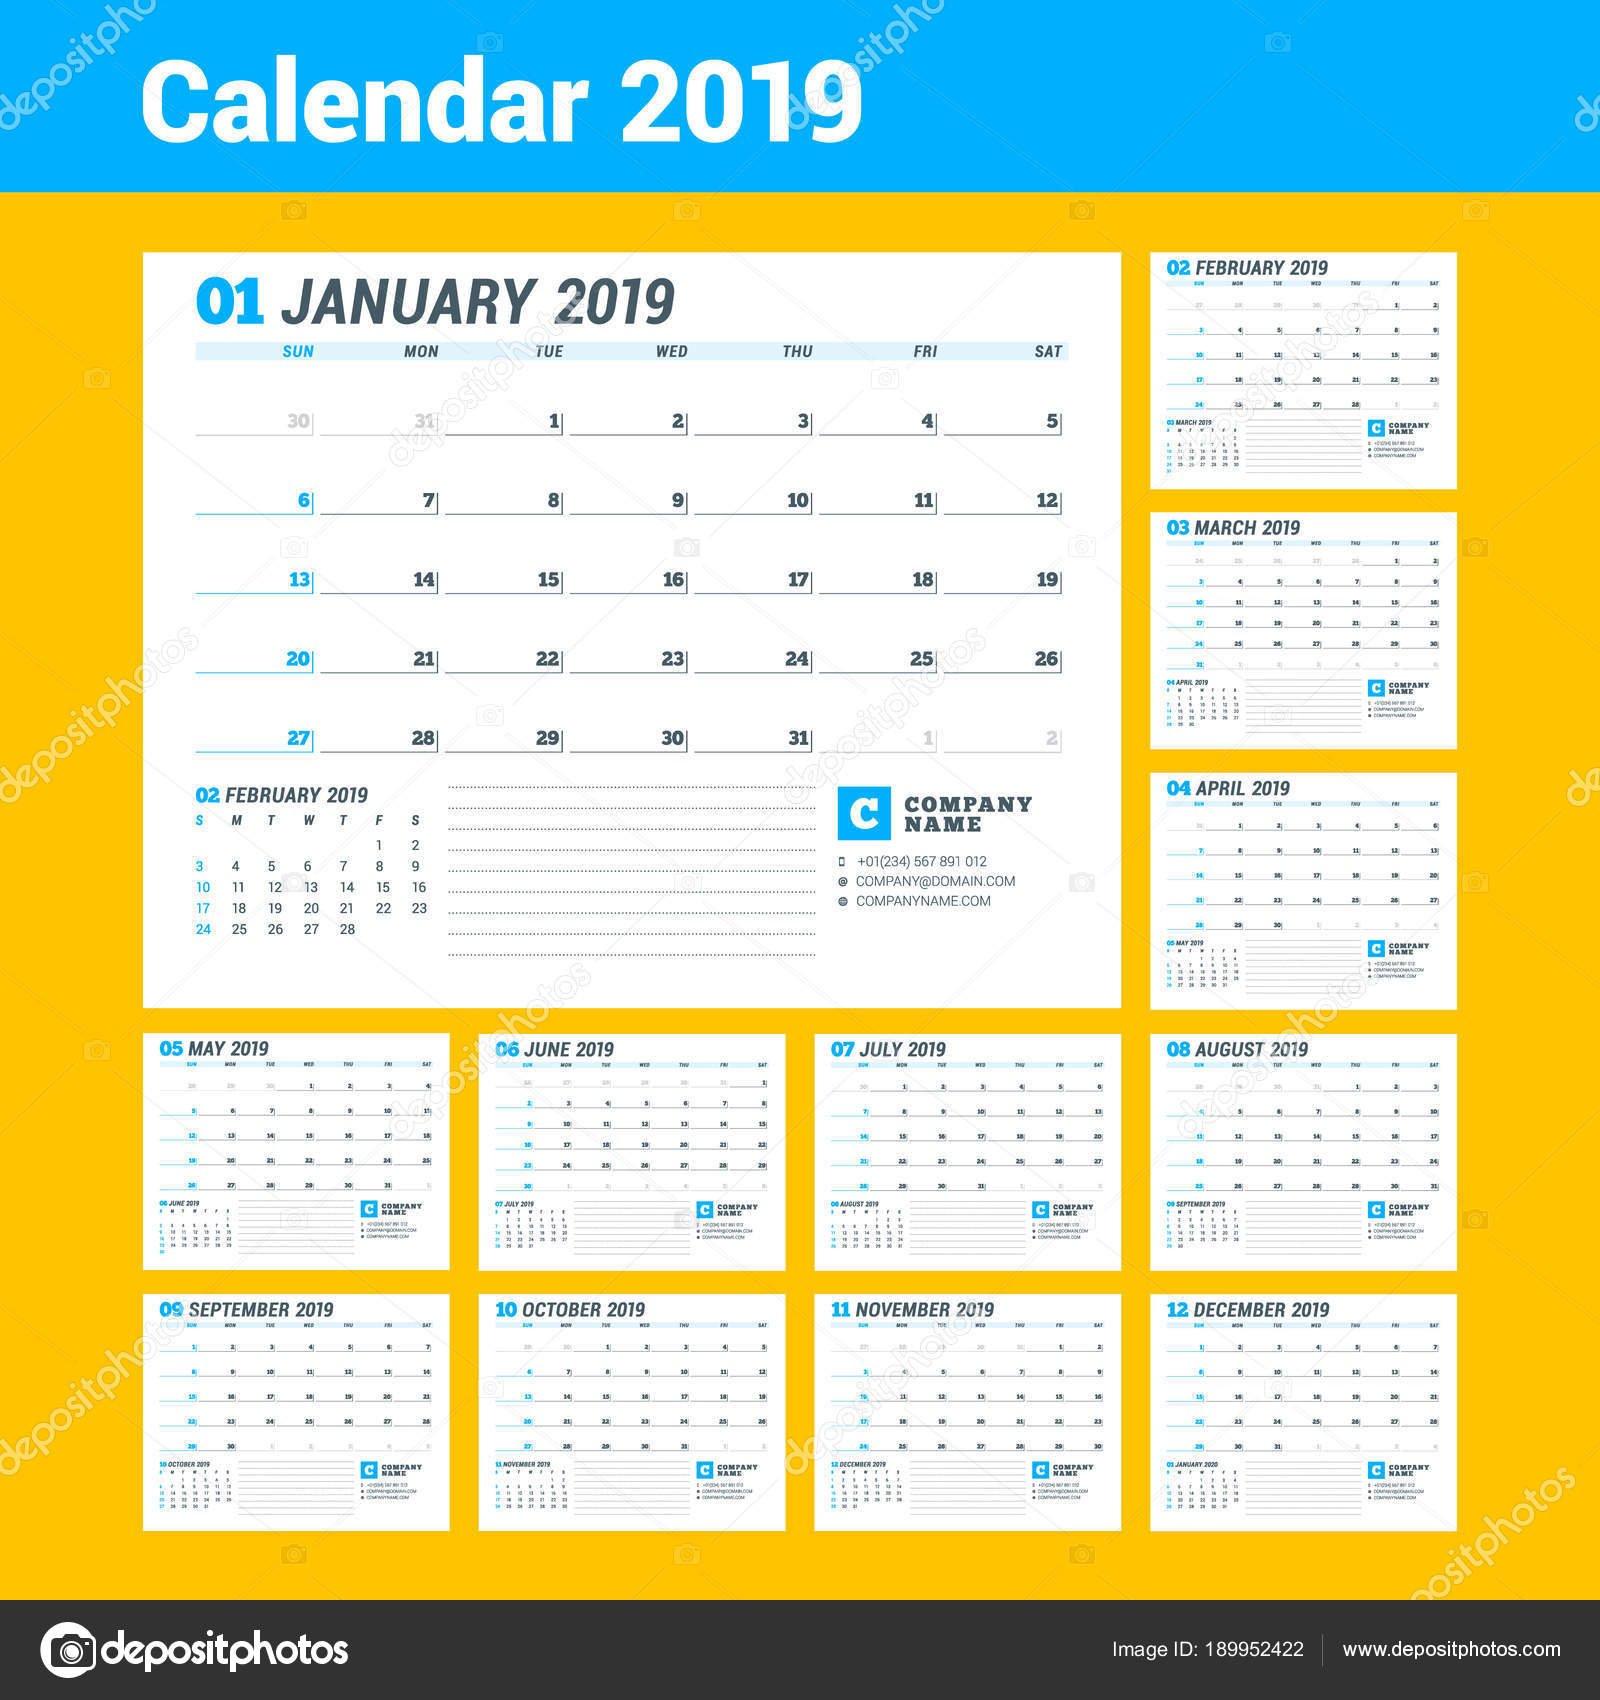 Calendar Template For 2019 Year. Business Planner. Stationery Design Calendar 2019 For Business